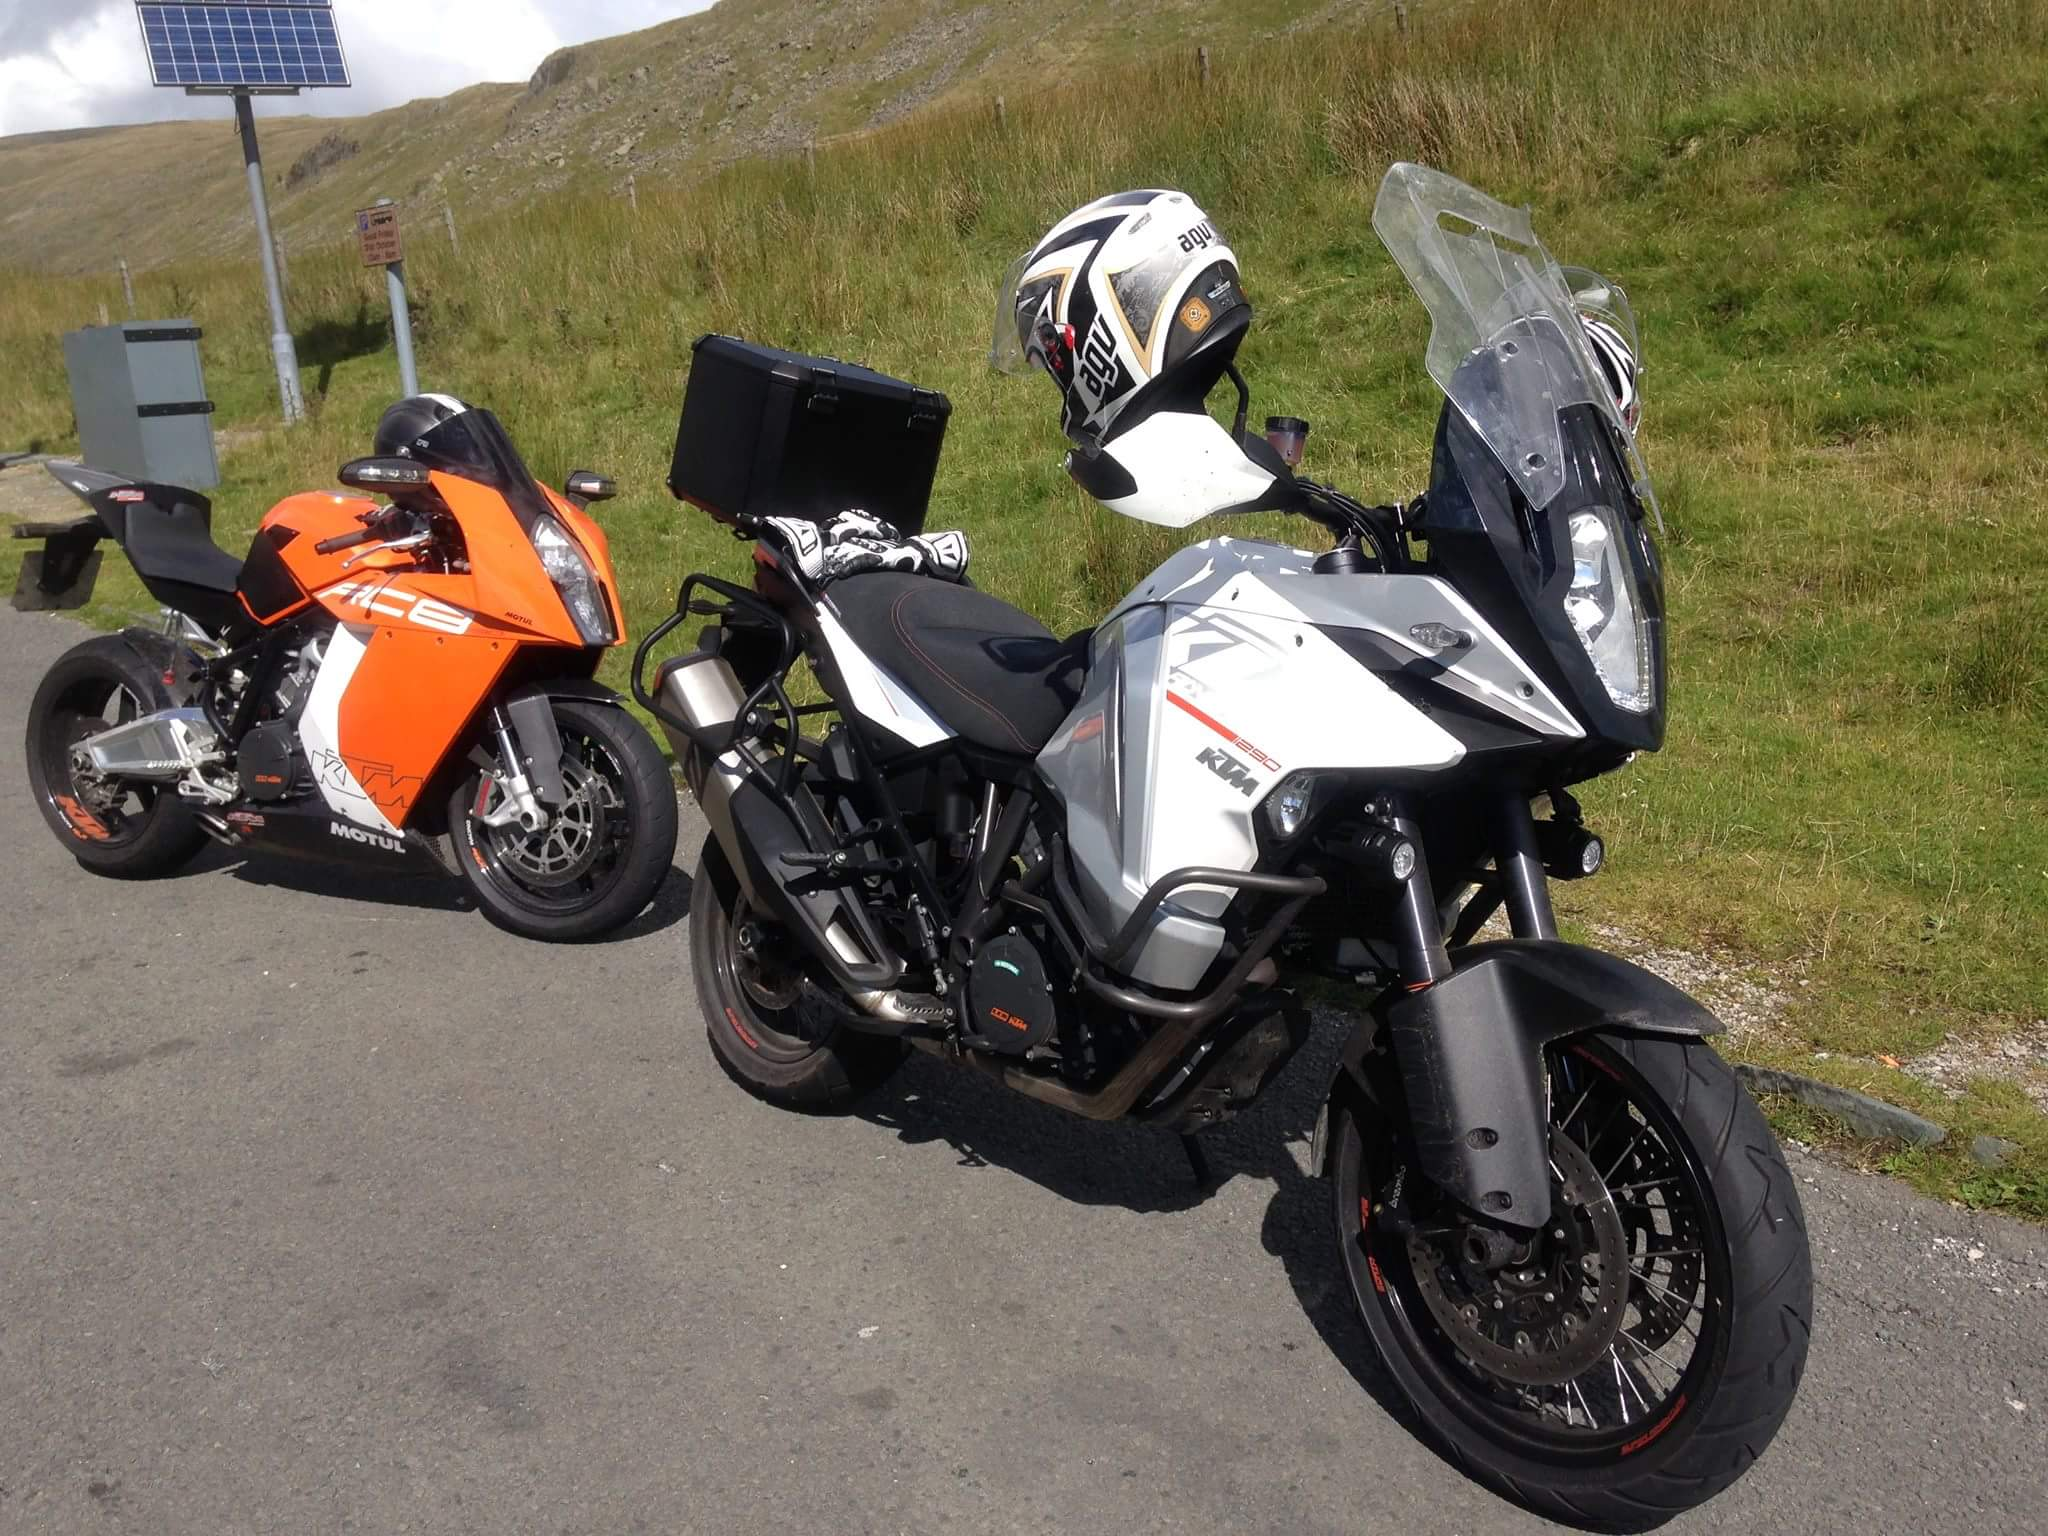 David Woollands (2) – KTM 1290 Super Adventure